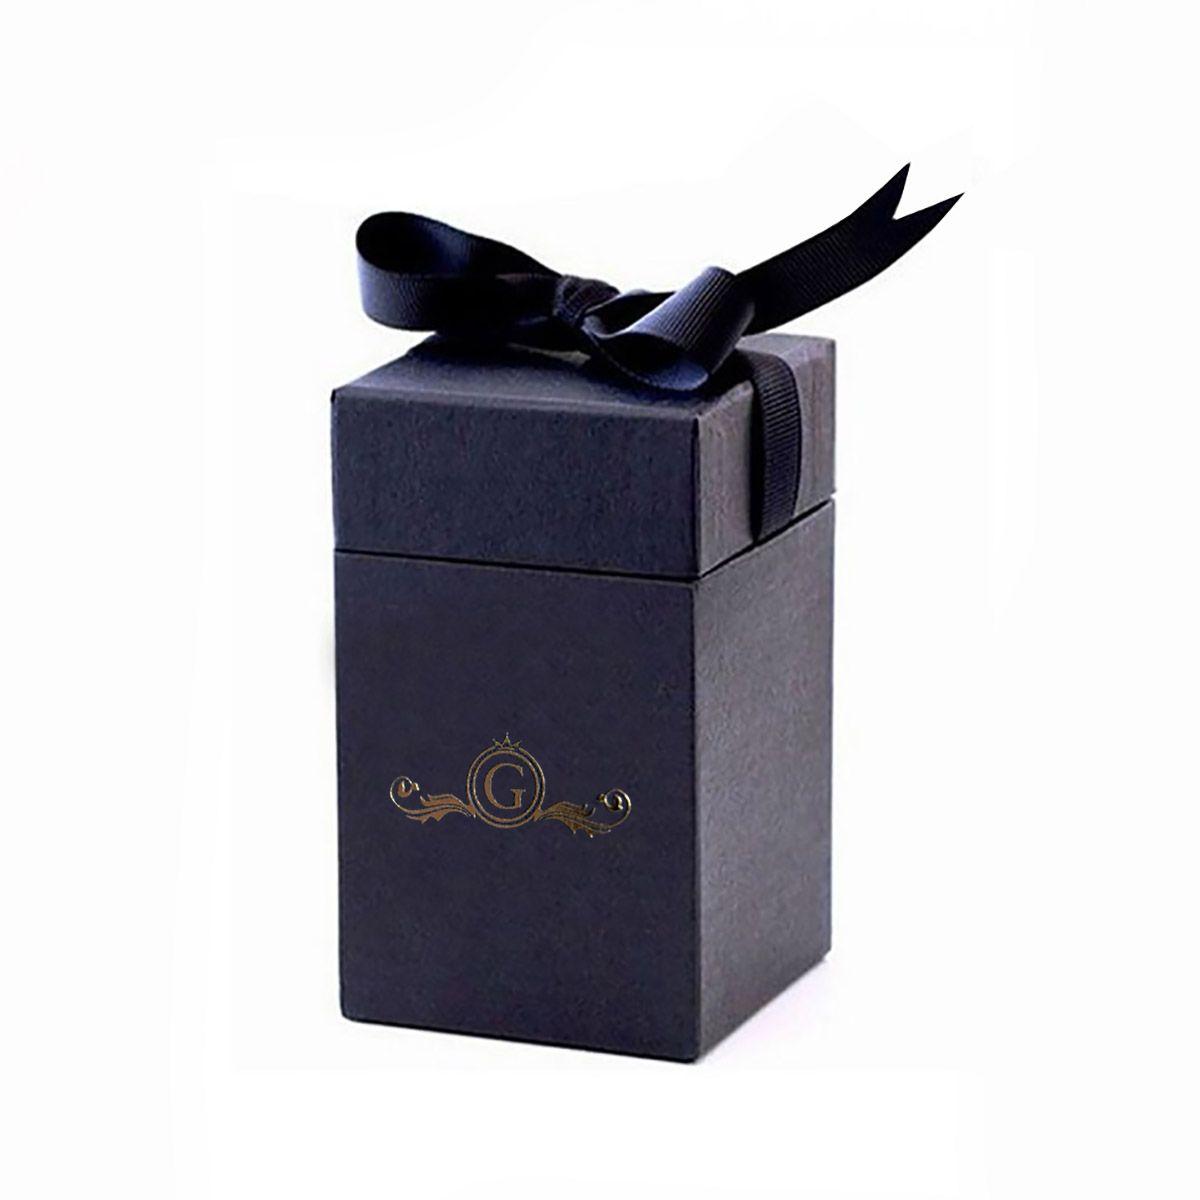 Favor Boxes Favors Brown Dotted Favor Boxes Wedding Favor Brown Favor Boxes Gift Box Round Favor Boxes Qty 6 Brown Round Favor Boxes